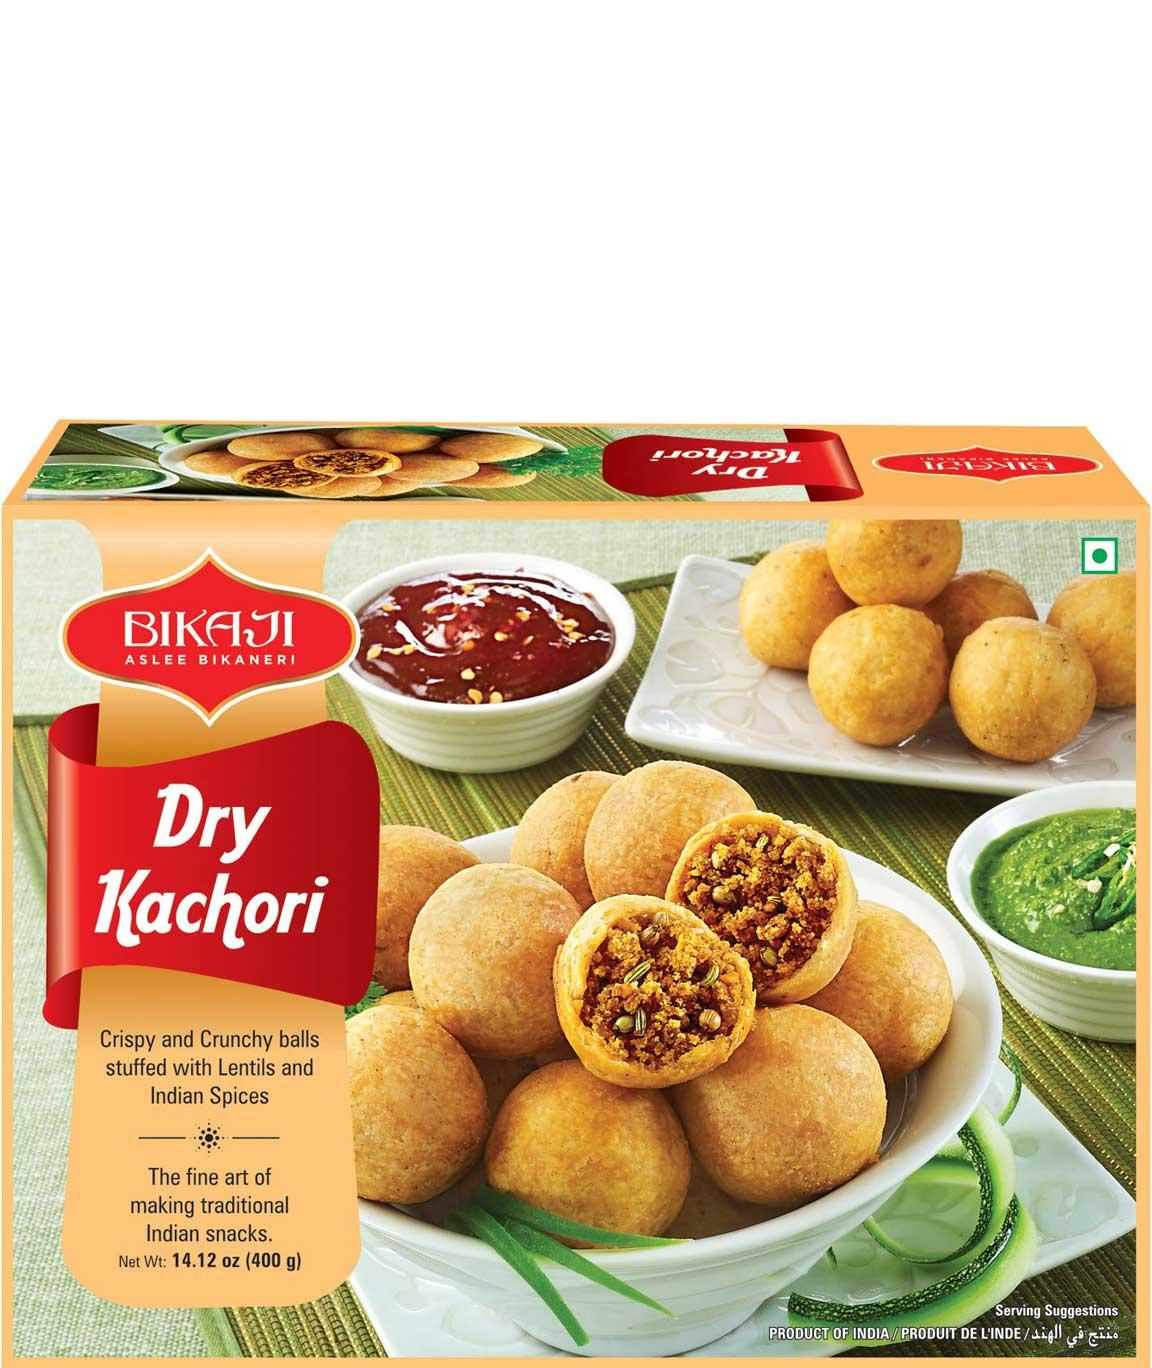 Bikaji Aslee Bikaneri - Dry Kachori 400g - 100% Vegetarian - Indian Namkeen Snack - Pack of 2